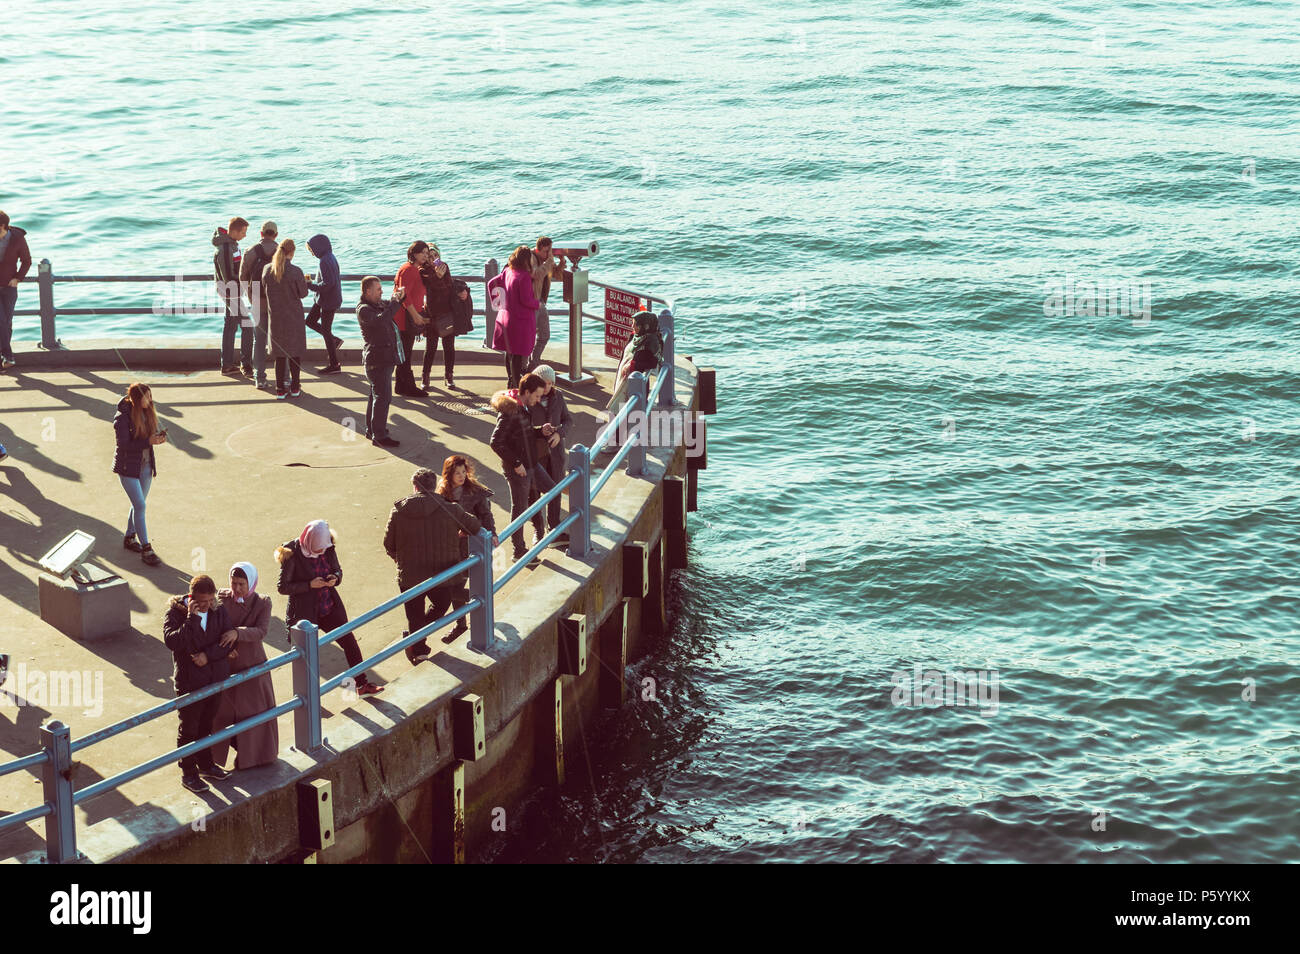 Istanbul, Turkey - January 06, 2018: People viewing seascape on the pier near Galata Bridge in Istanbul, Turkey. Stock Photo